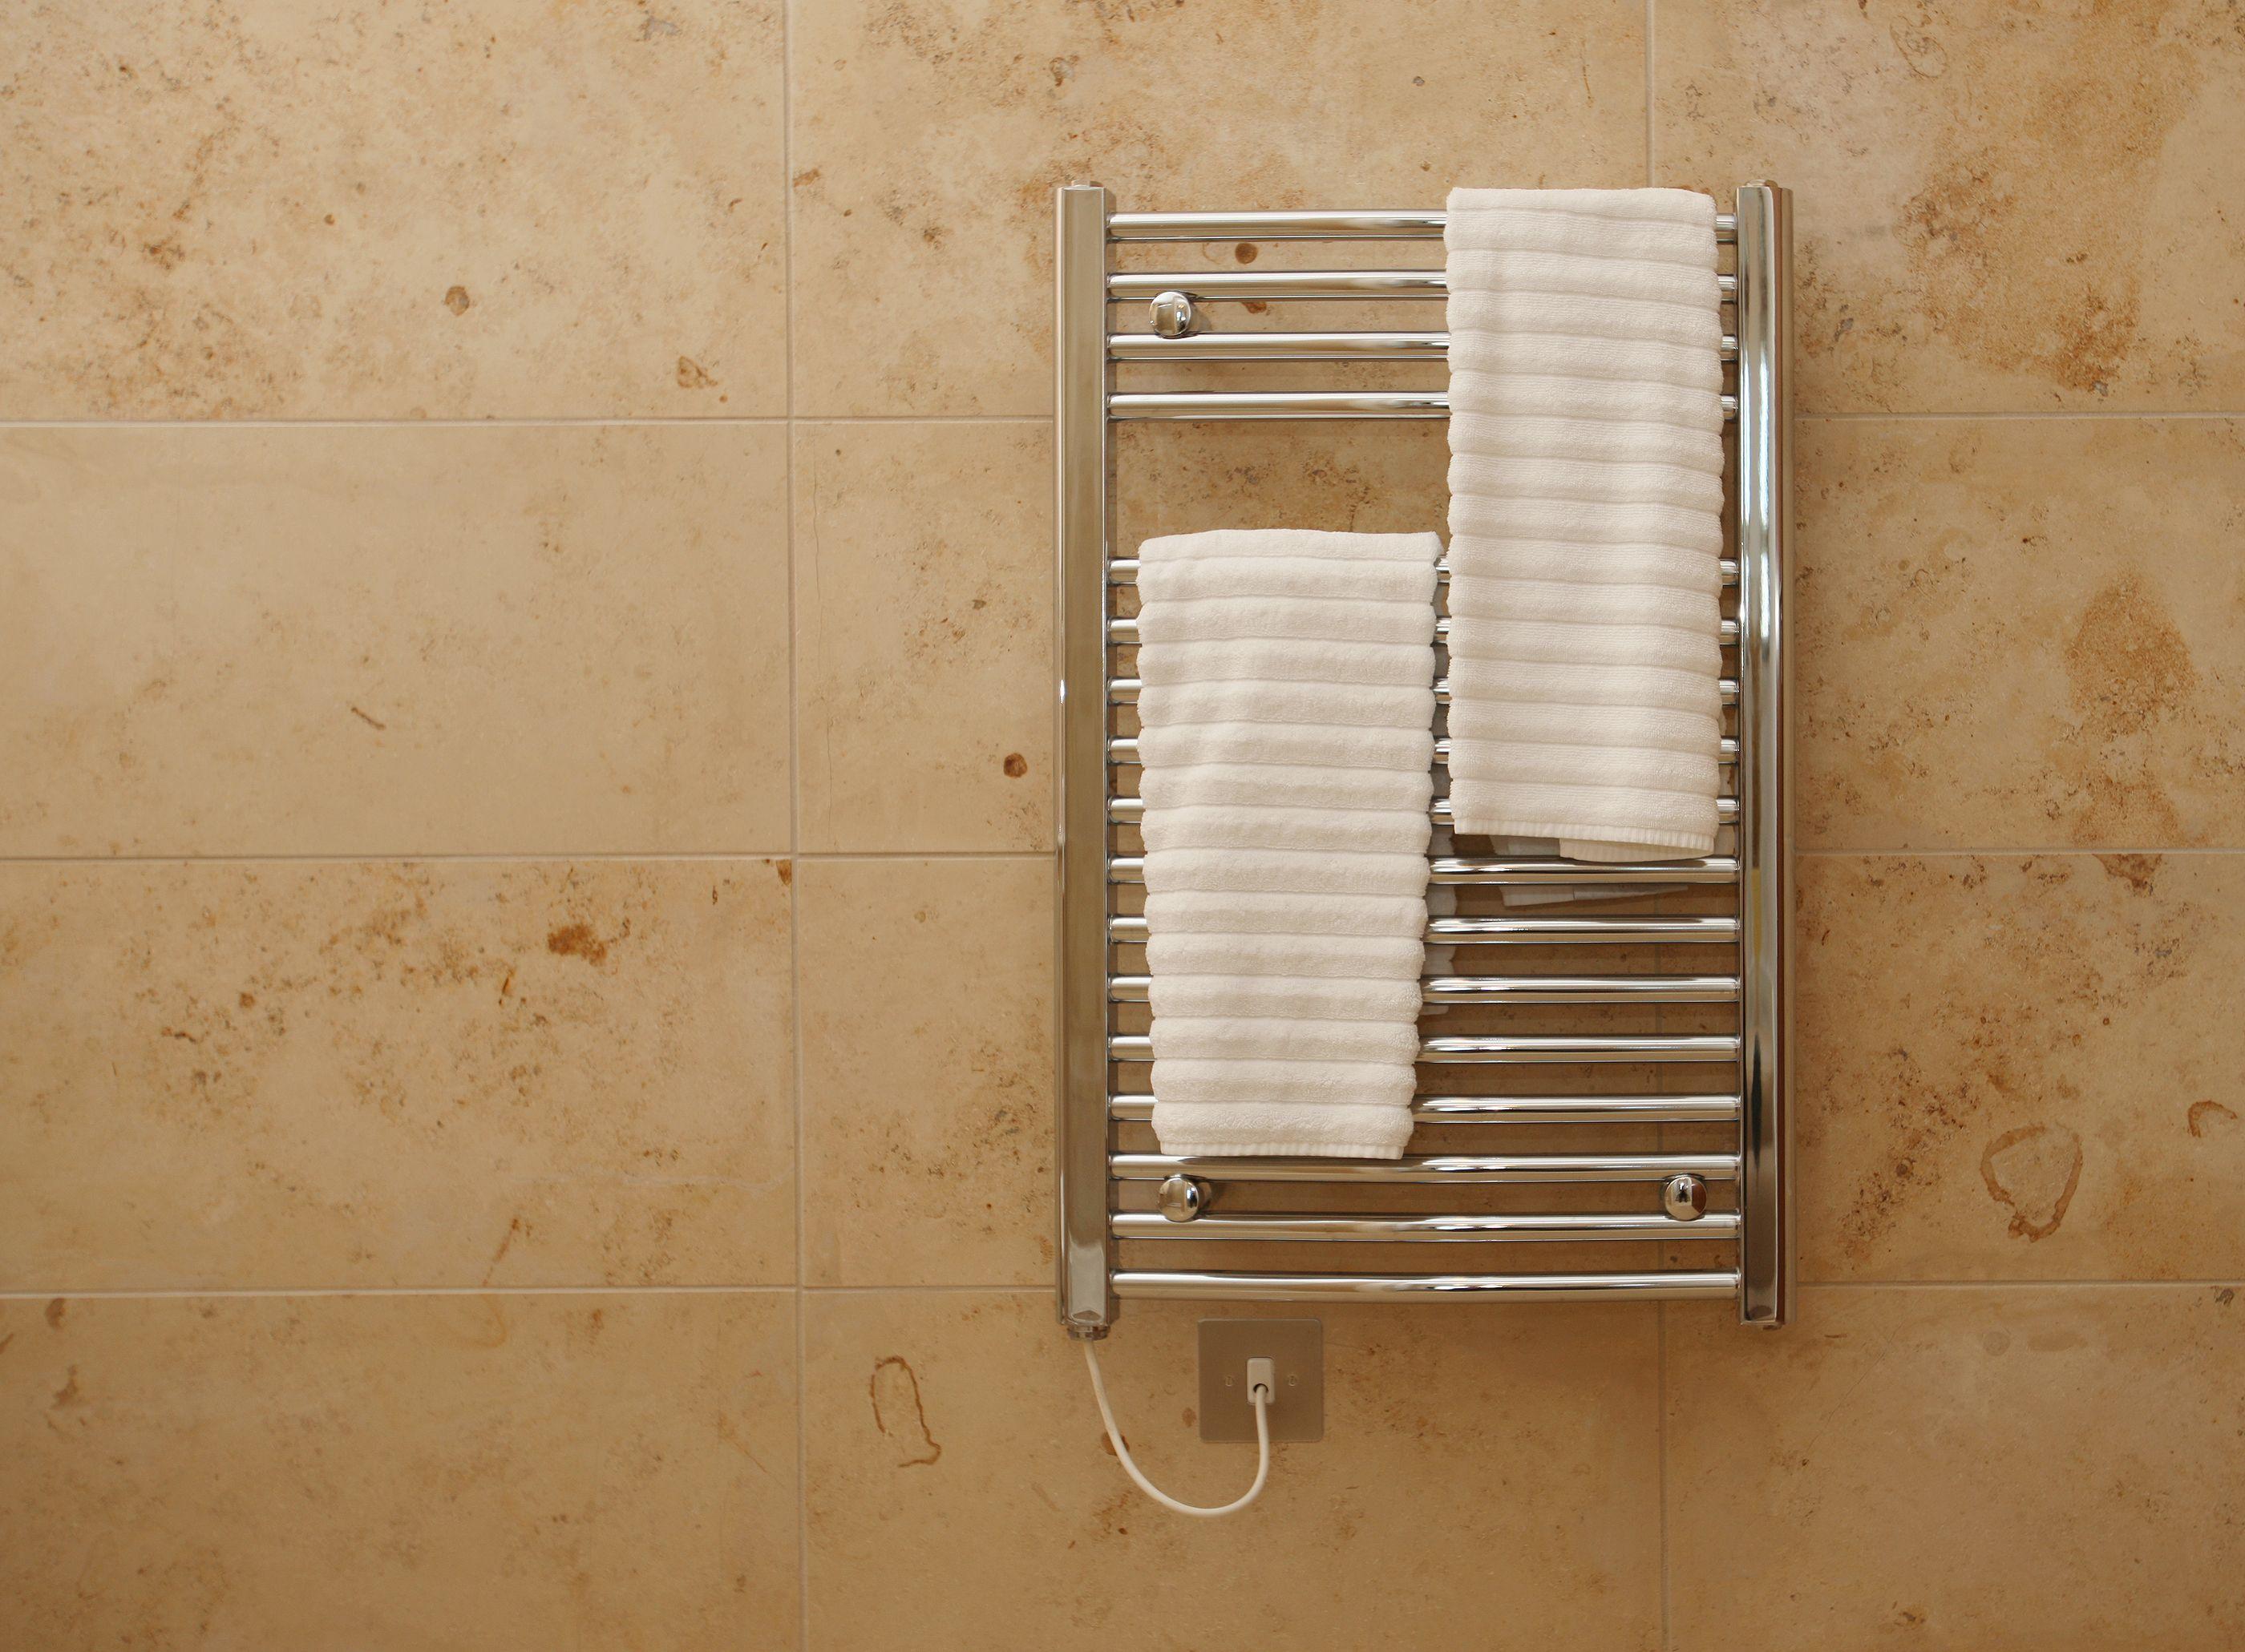 Instalación de toalleros en Zaragoza